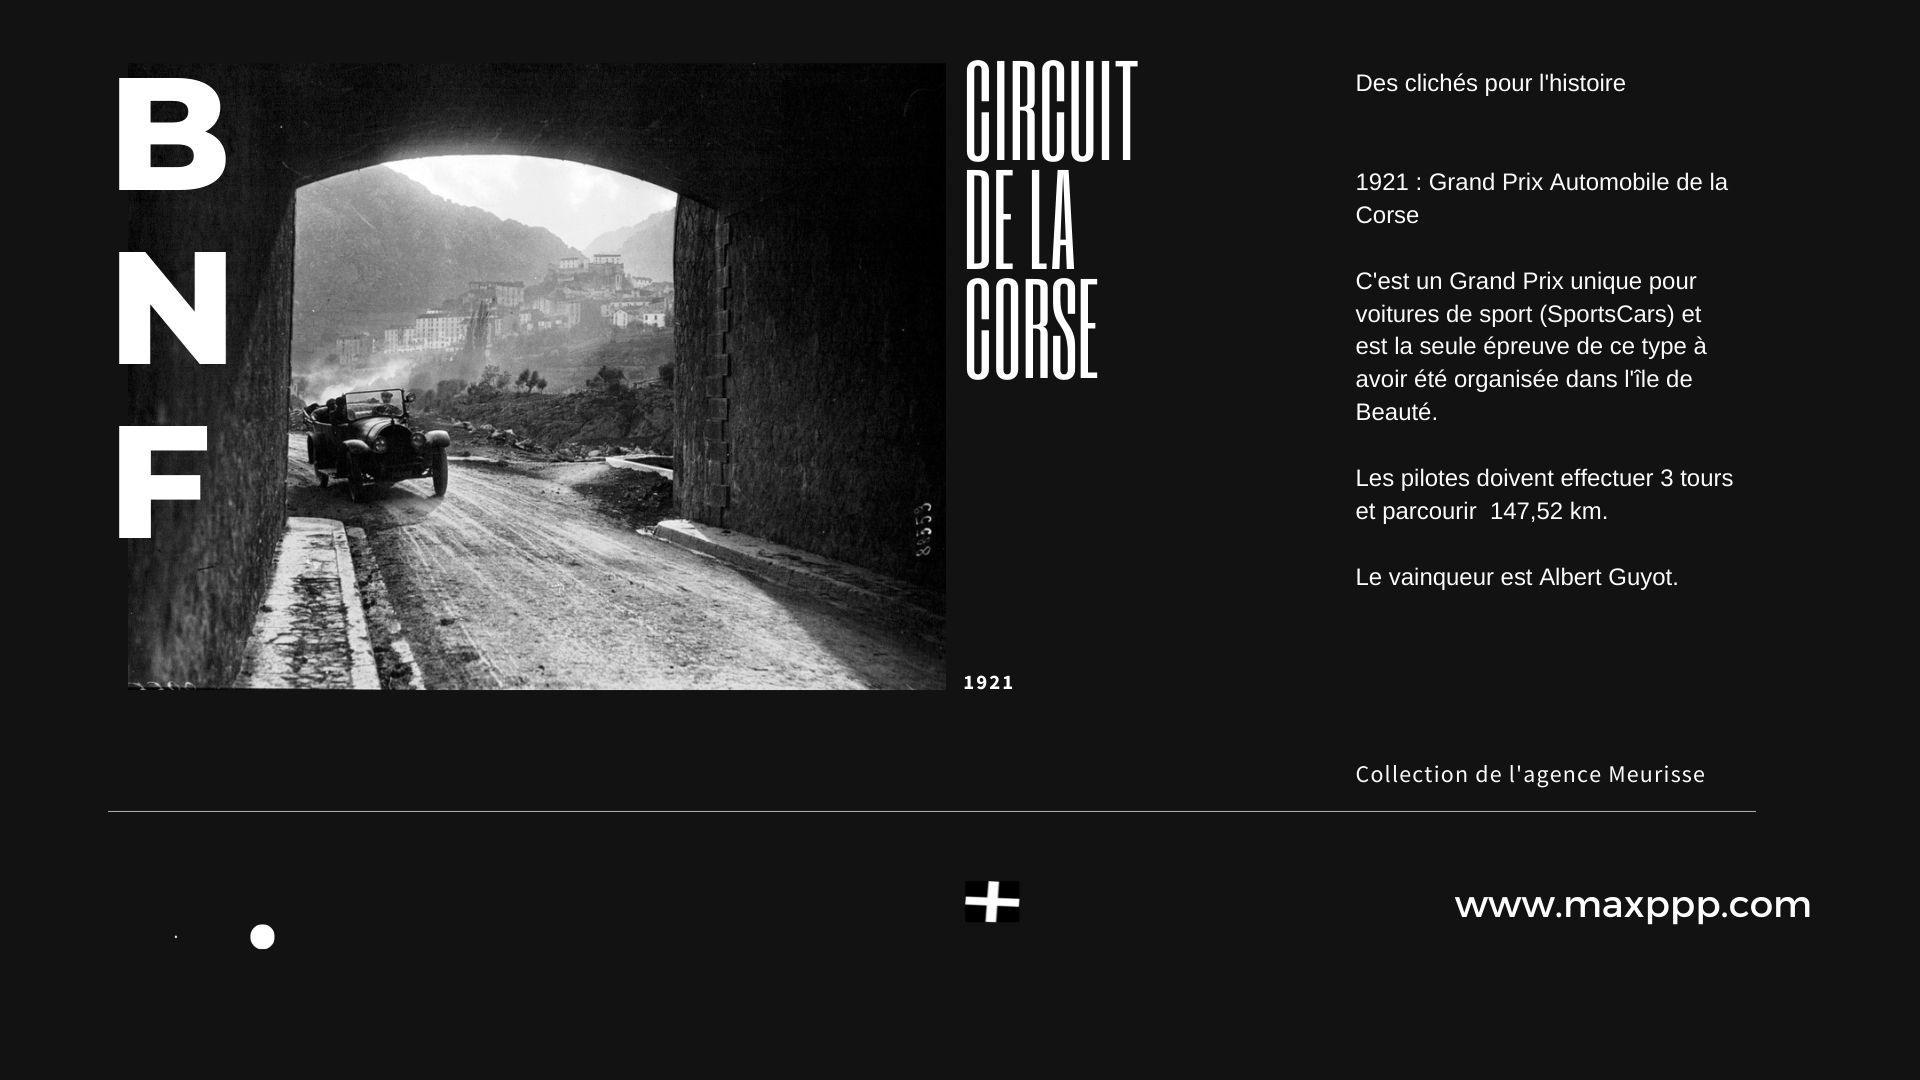 Circuit de la Corse